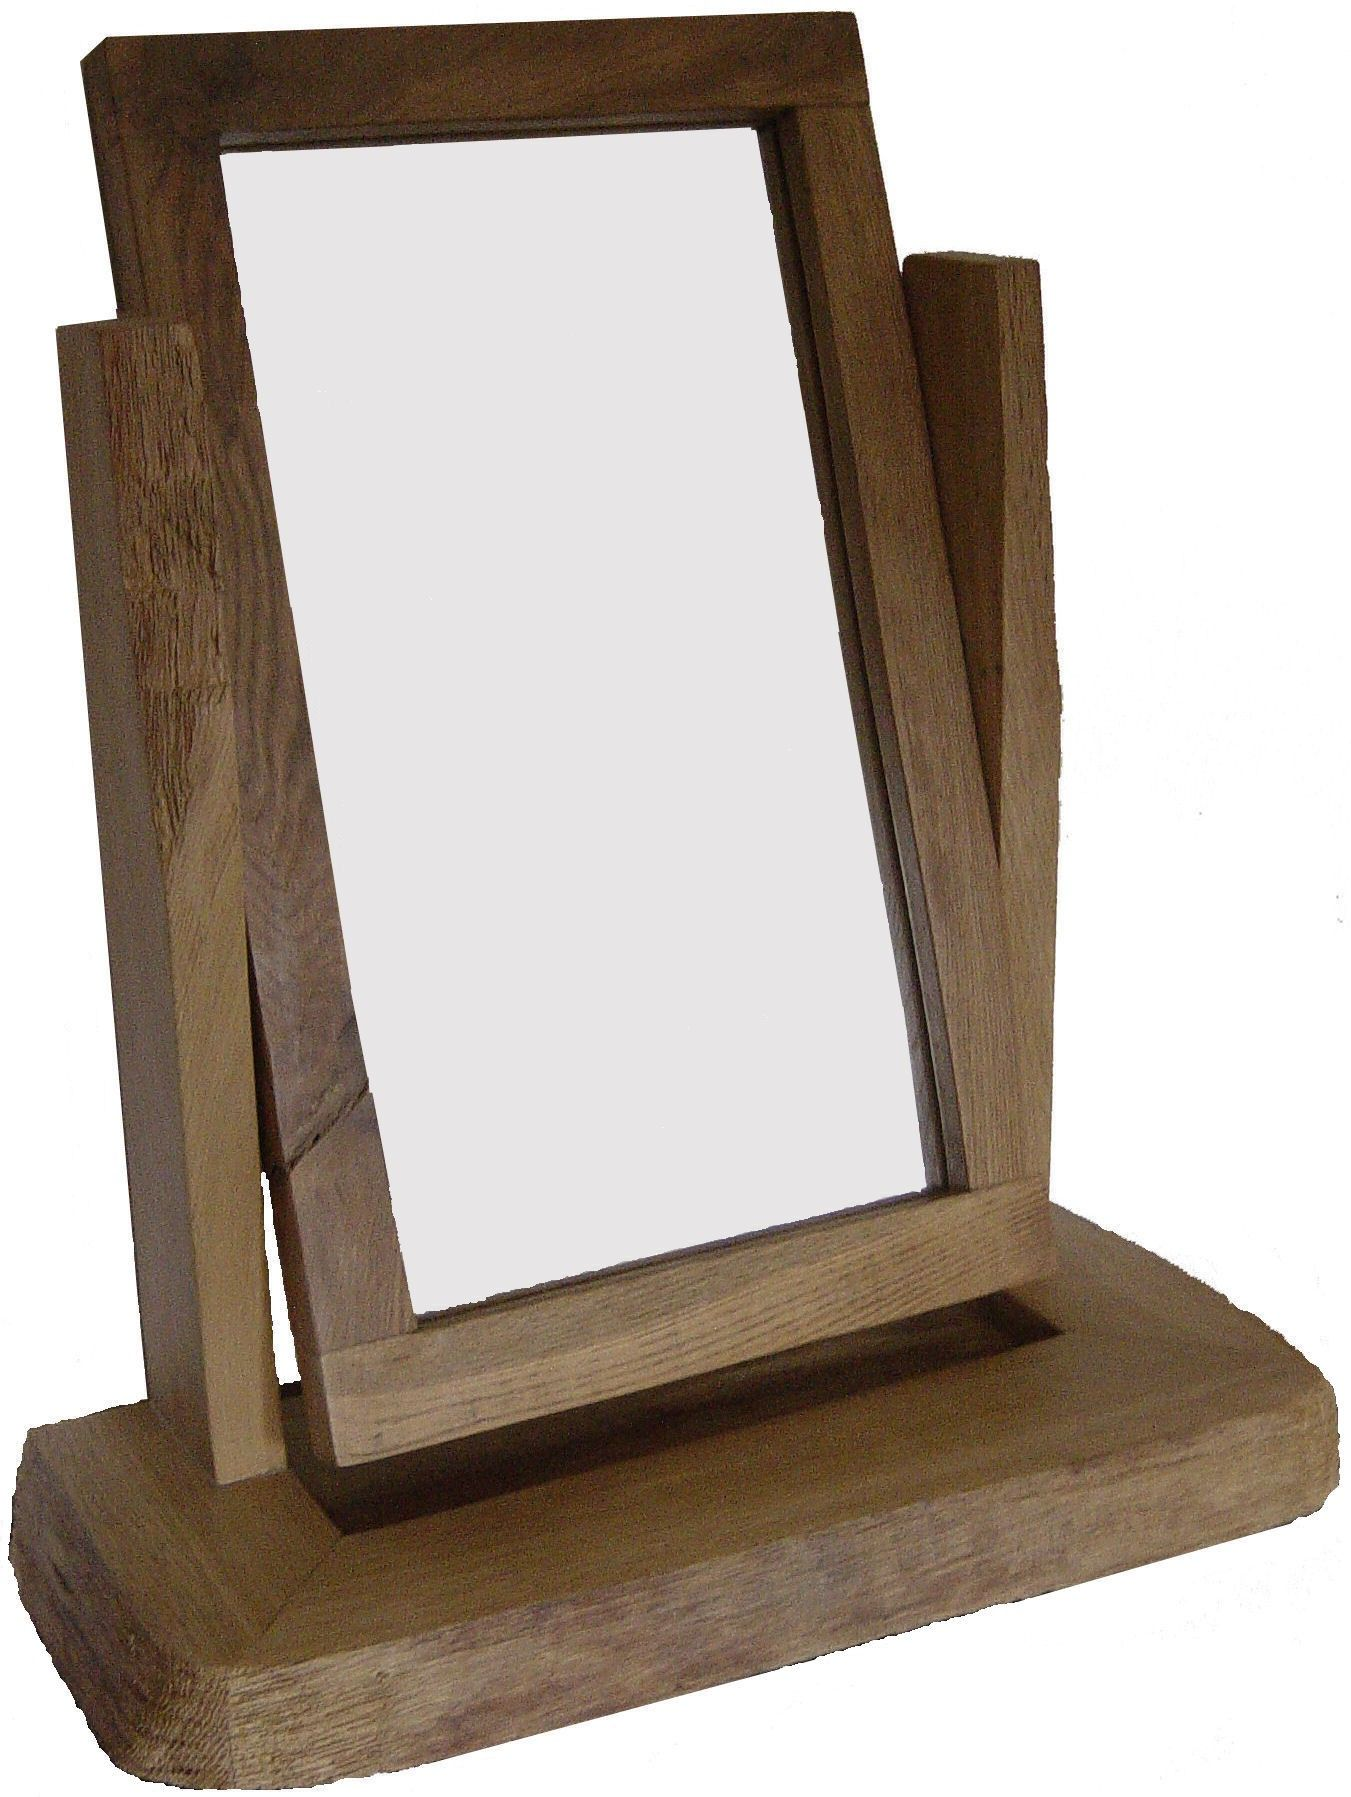 rustic mirror waney edge desk top mirror pinterest rustic